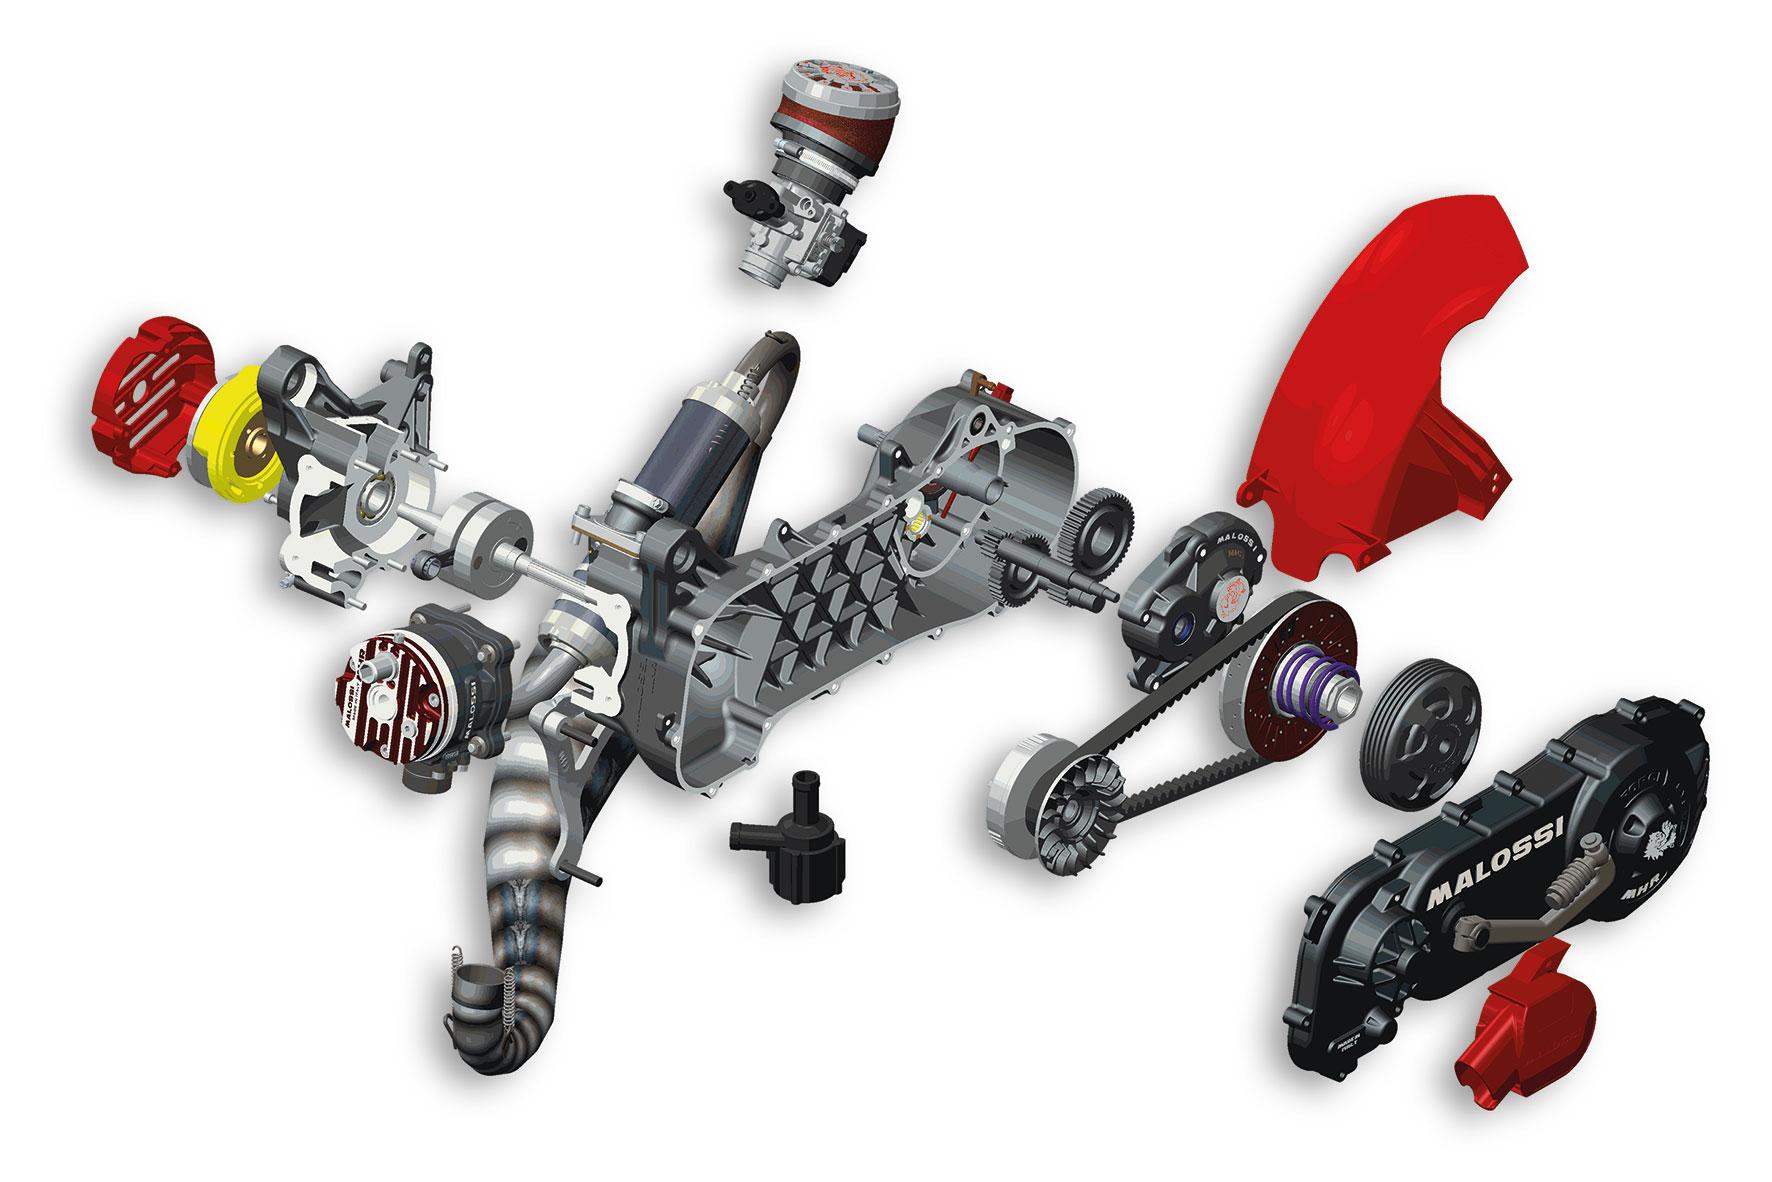 Motor completo RC-ONE 94cc desmontado para motor Yamaha